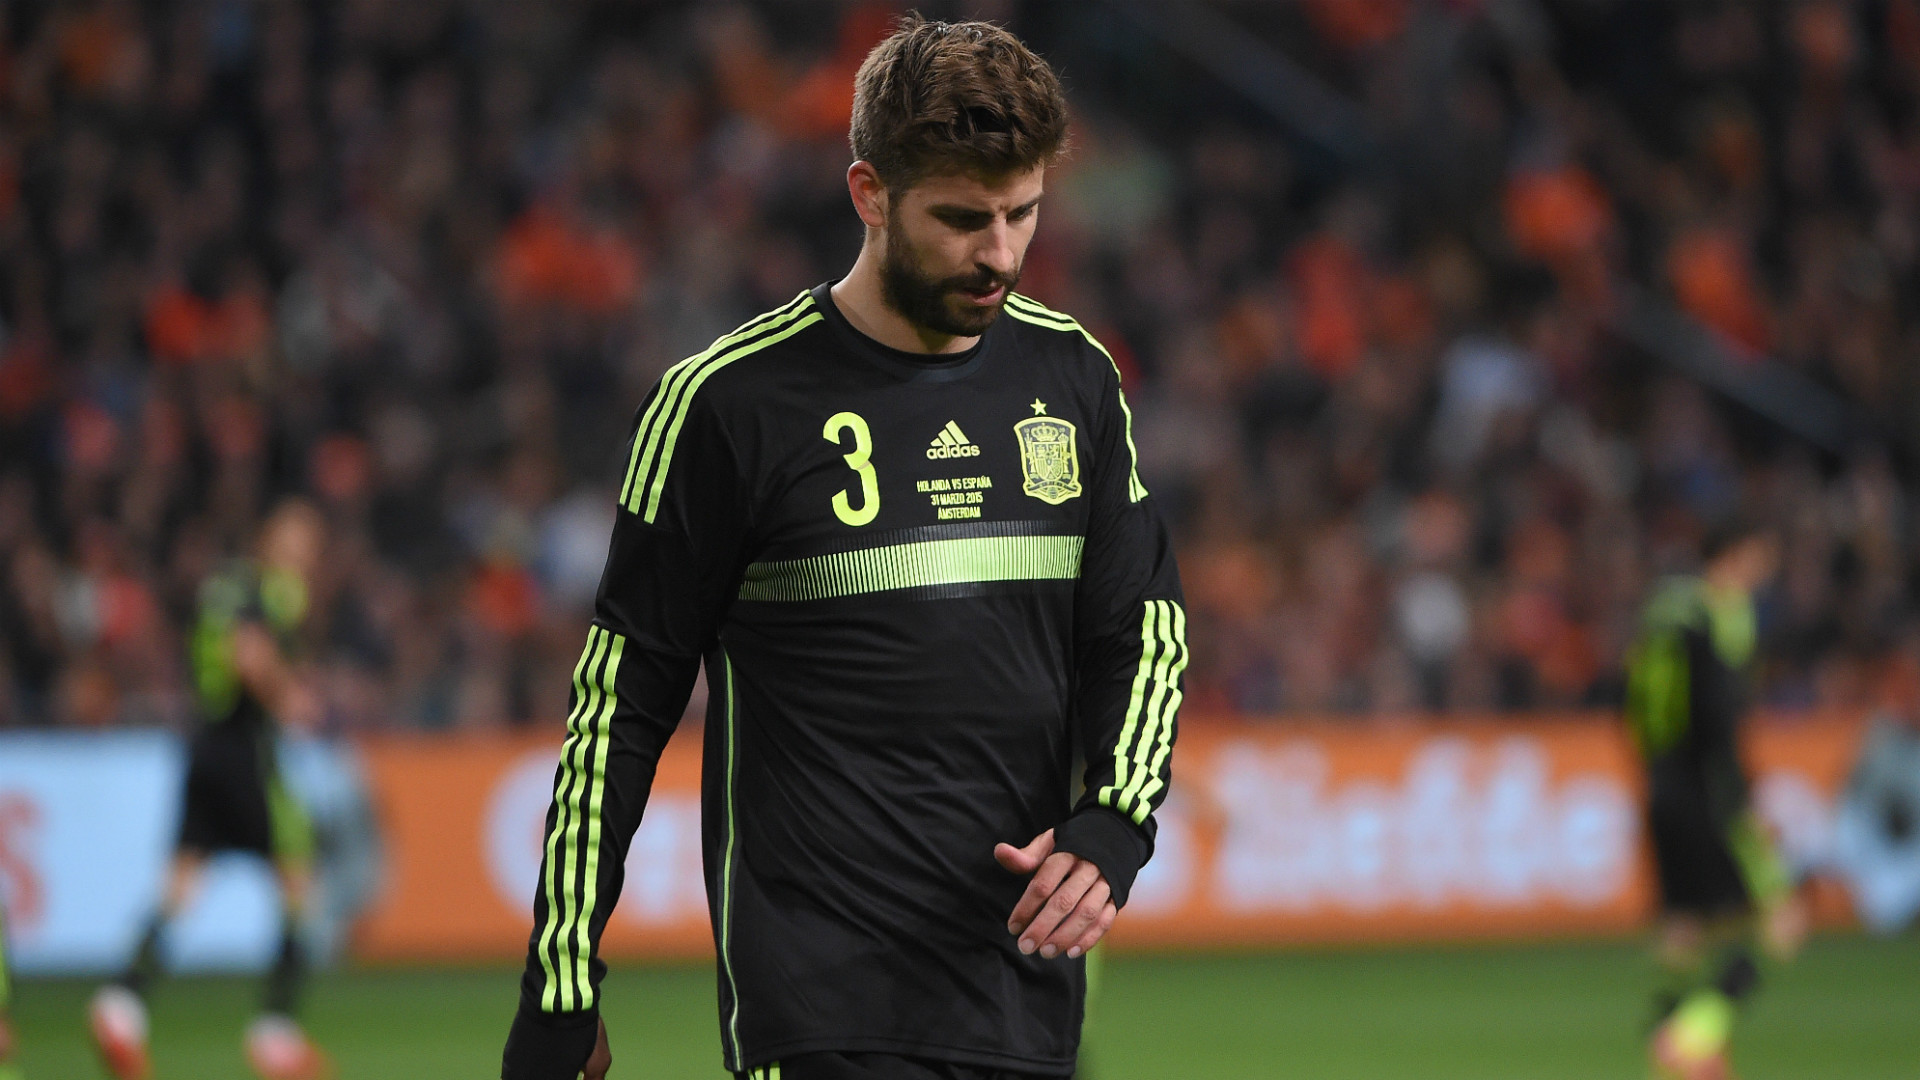 Del Bosque: Pique night out was sanctioned